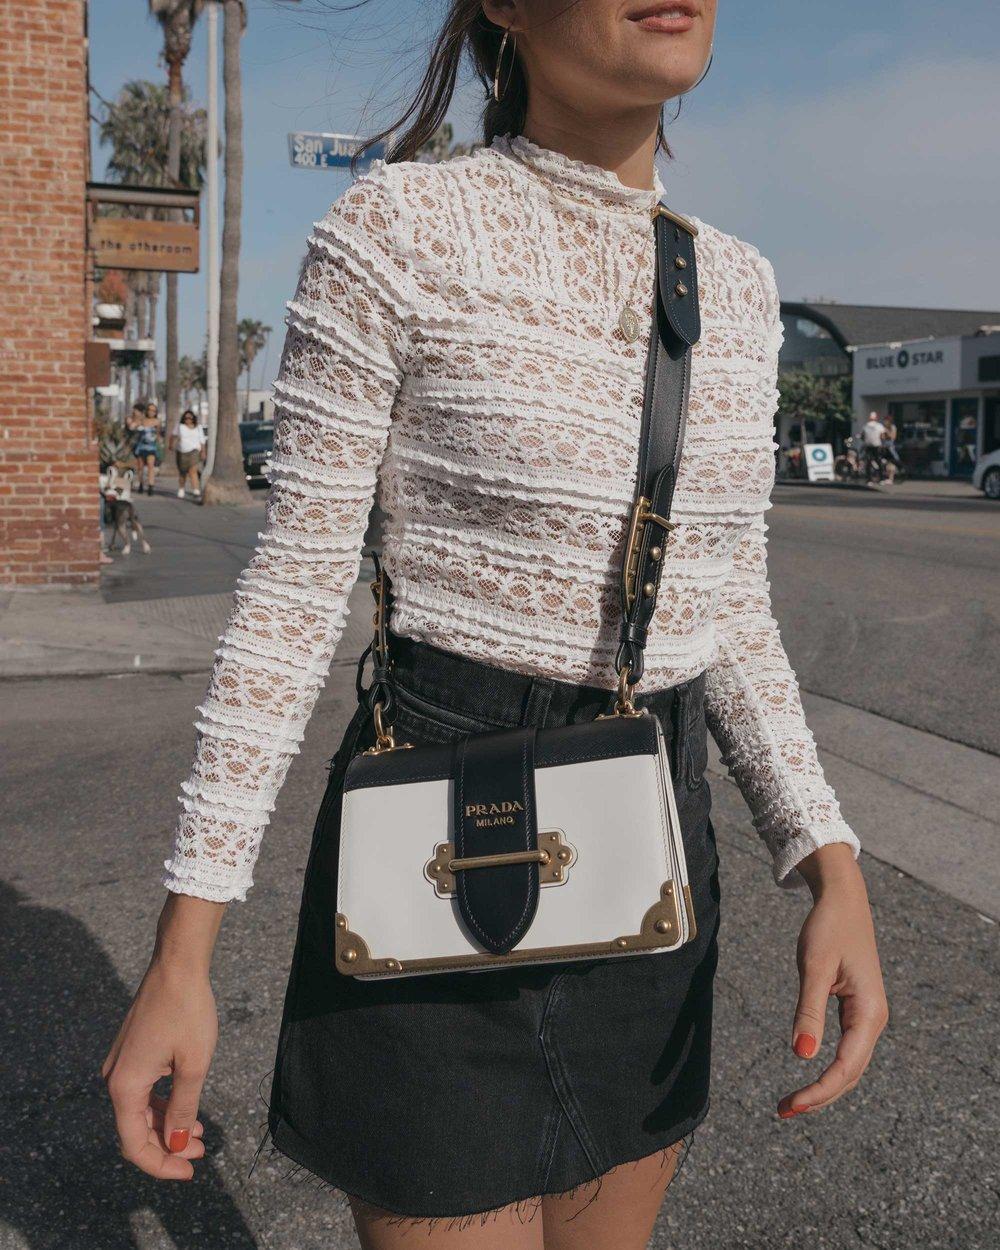 Prada City Saffiano Leather Cahier Bag, Black Denim Skirt, Summer outfit, Abbot Kinney California6.jpg